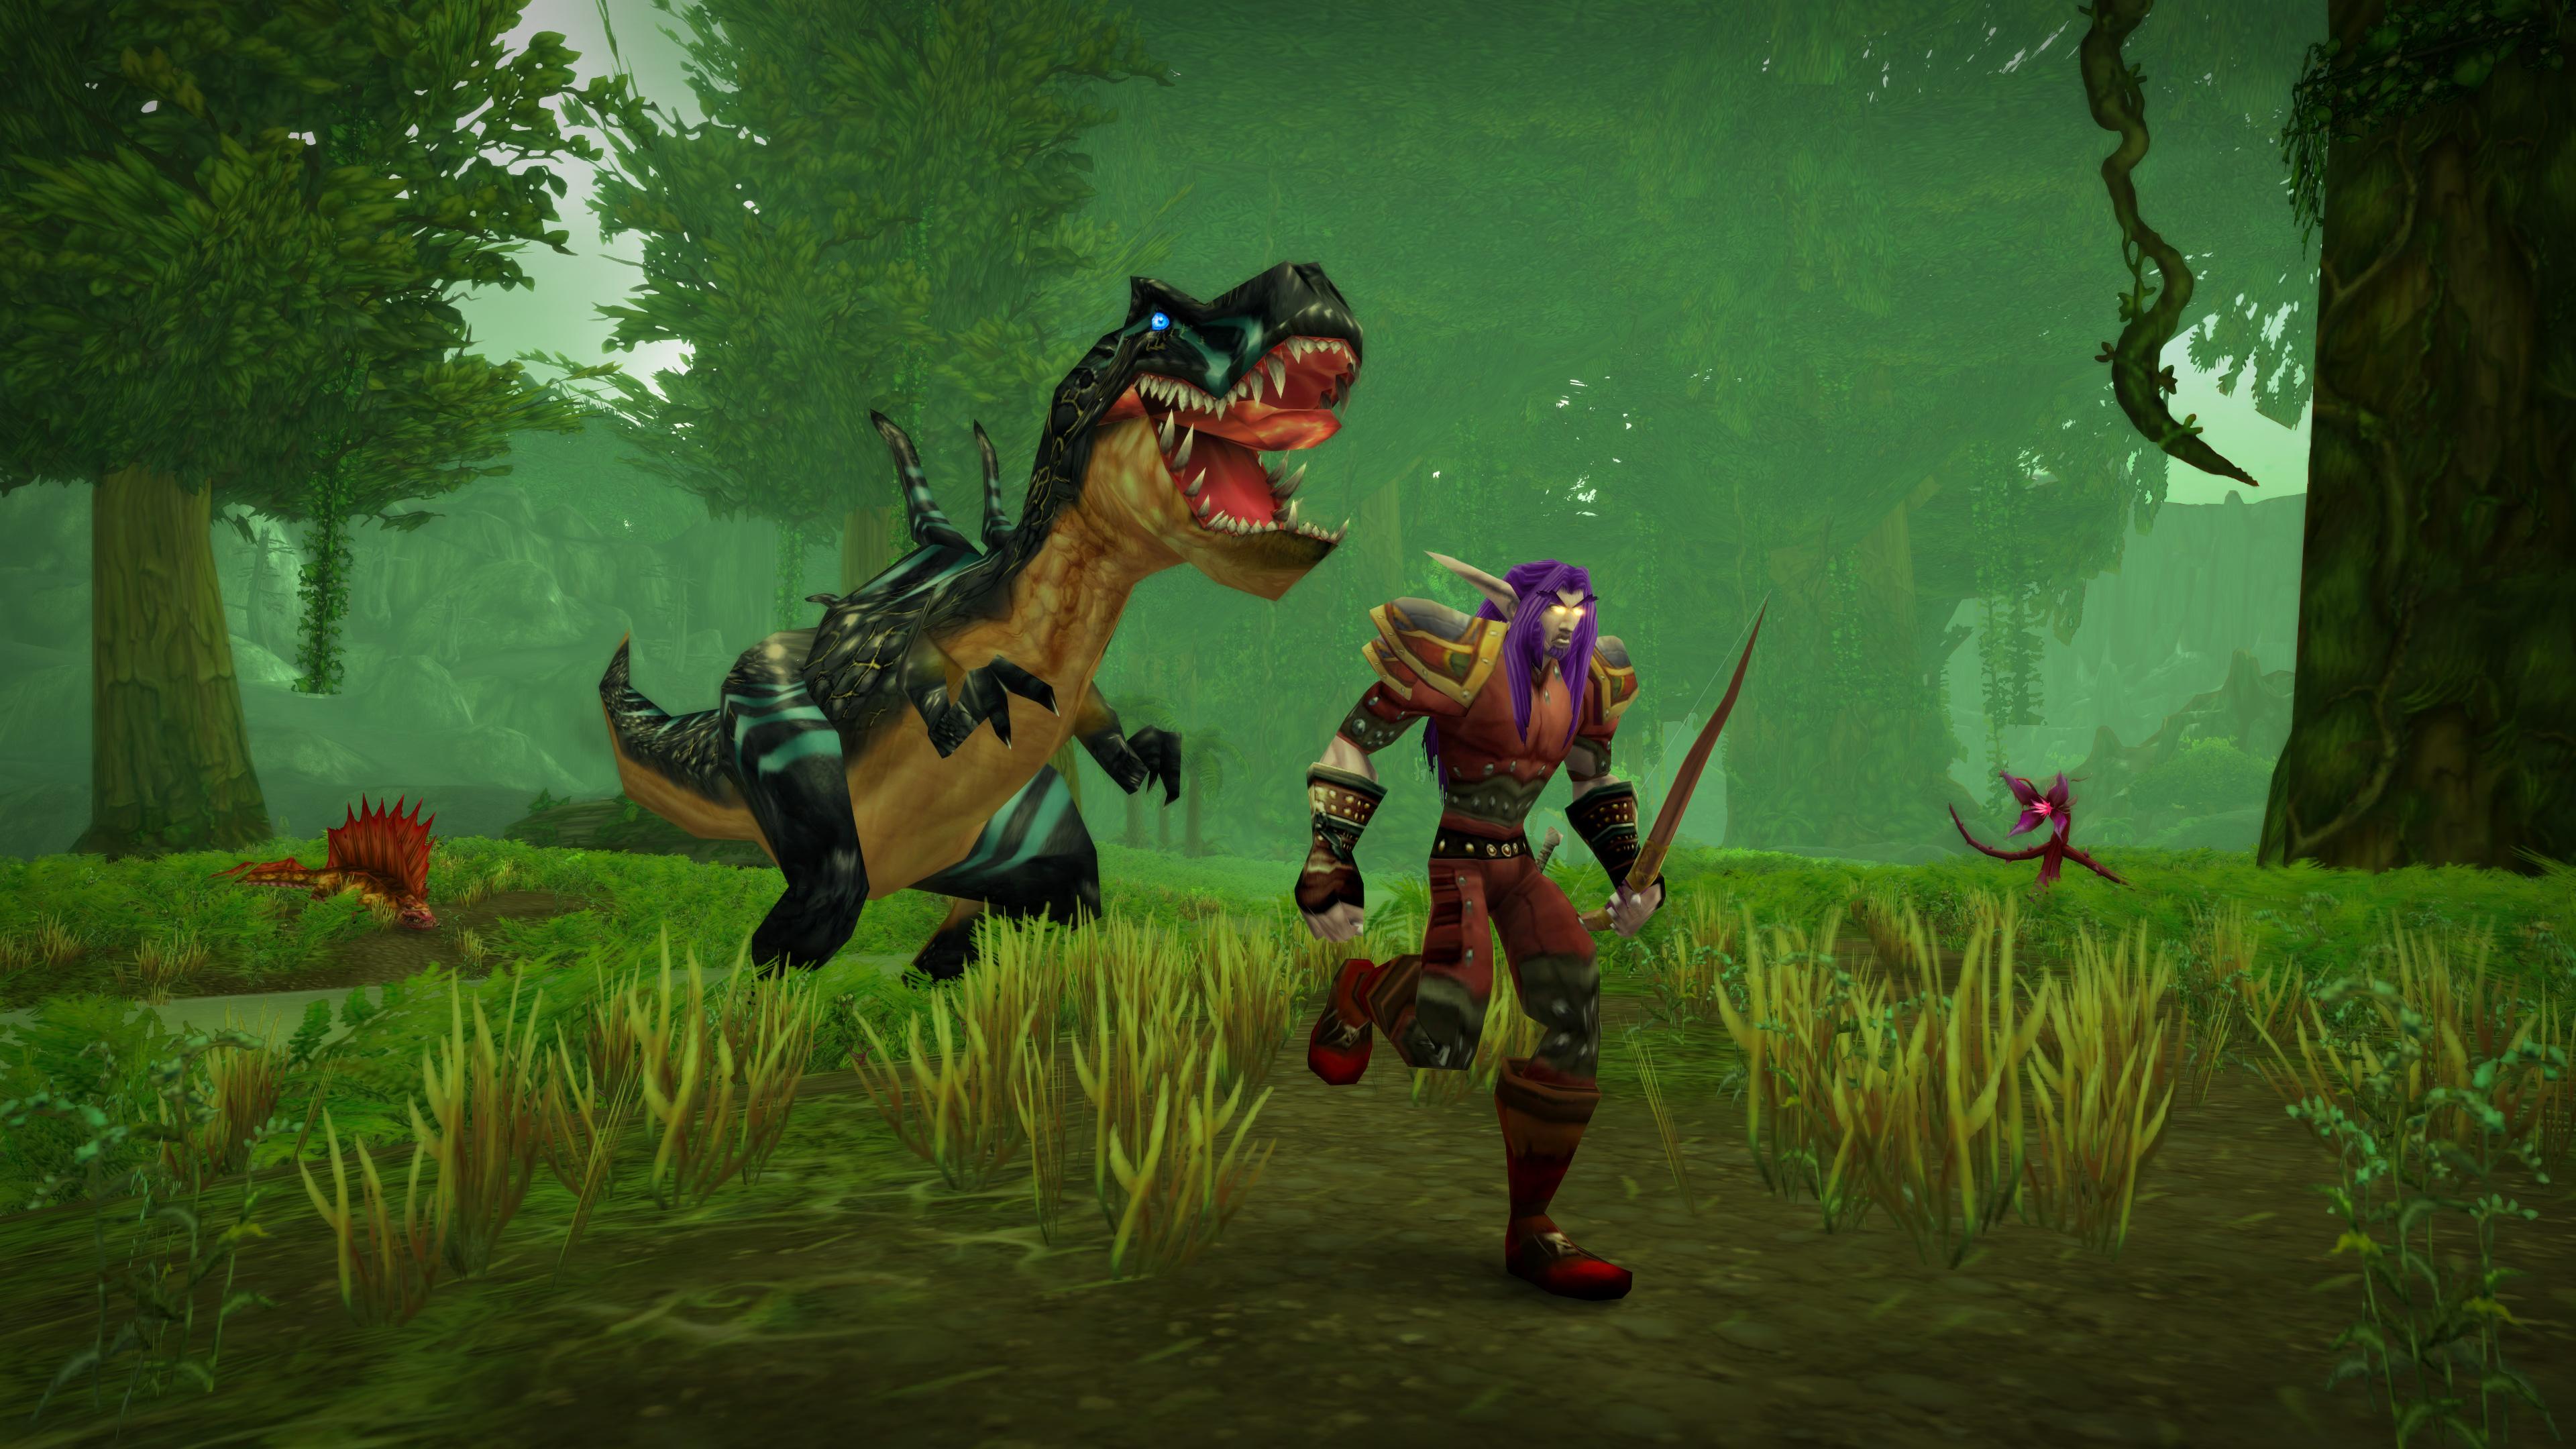 WoW_ClassicLaunchPressKit_UngoroHunter_1920x1080.jpg - World of Warcraft